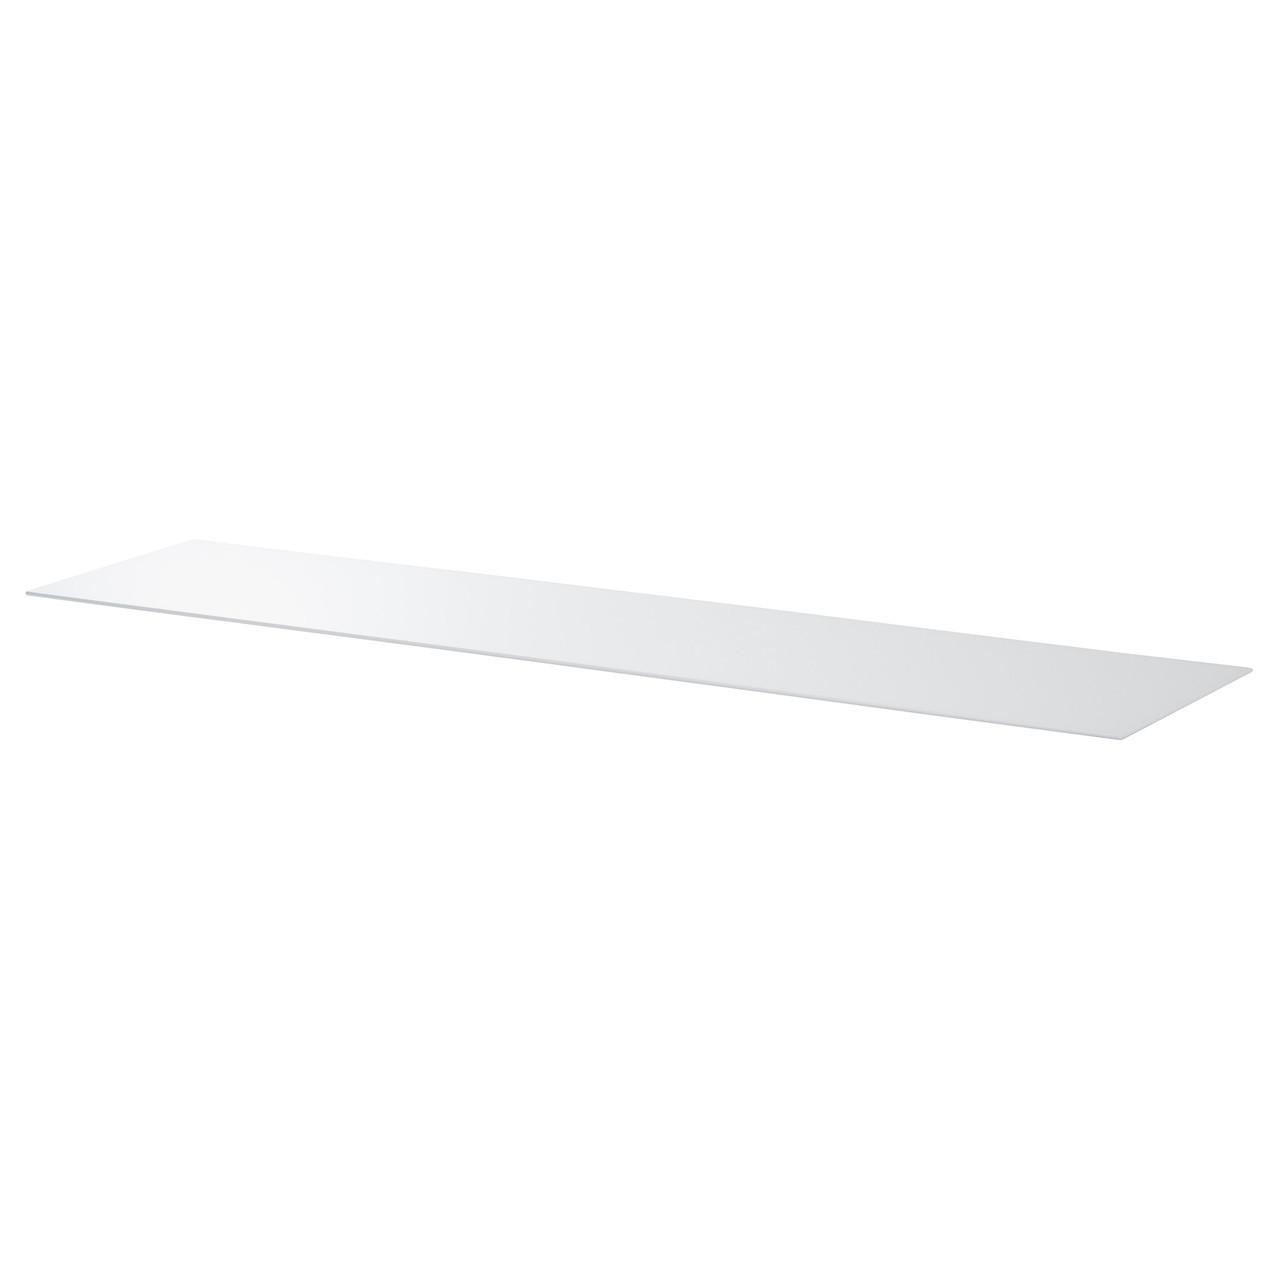 BESTÅ Верхняя панель, стекло белый 201.965.29